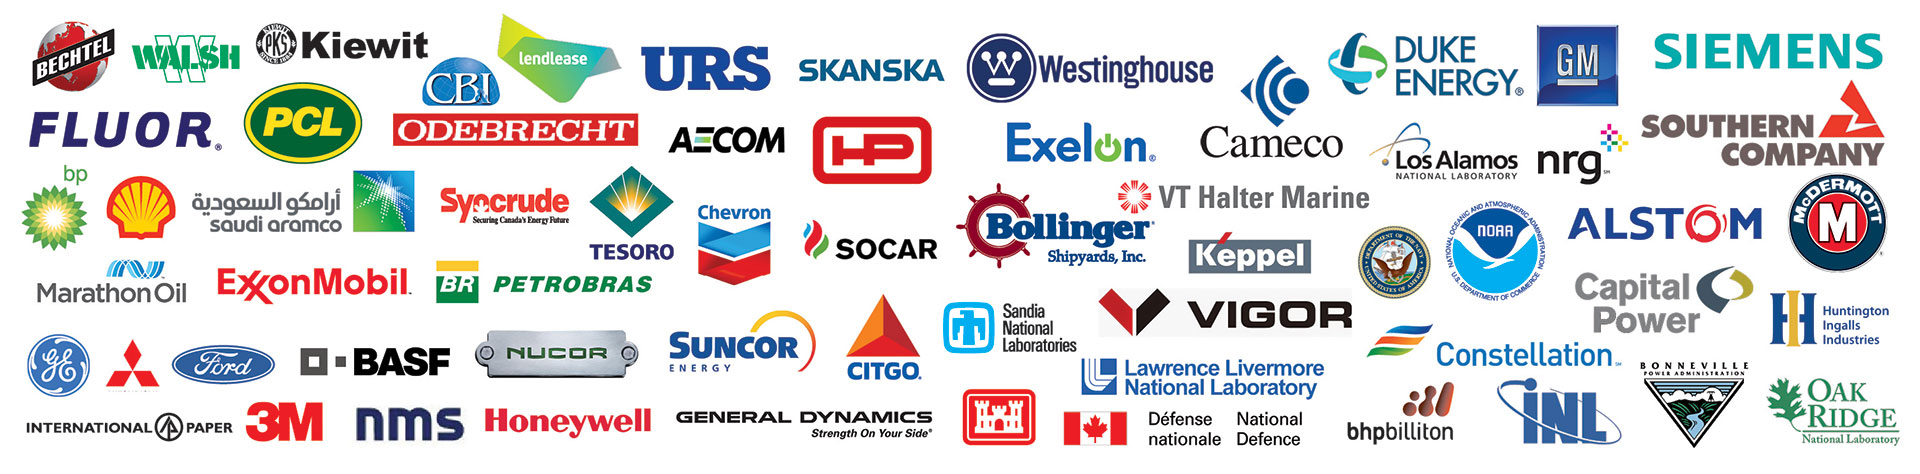 Organizations_web.jpg